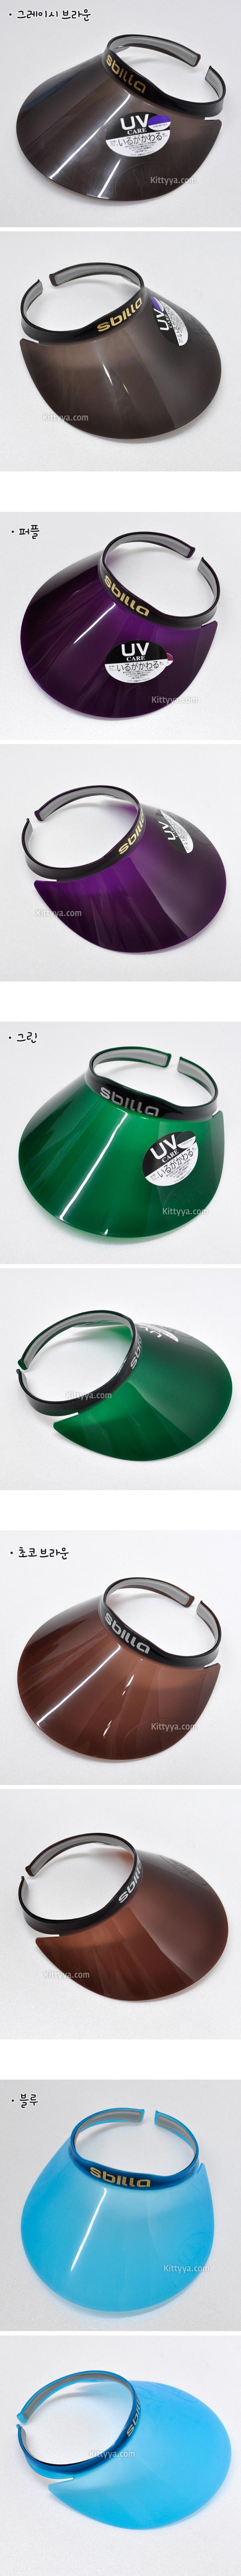 Sbilla JP 자외선 UV 차단 썬캡 (6color) - 키티야, 10,400원, 모자, 썬캡